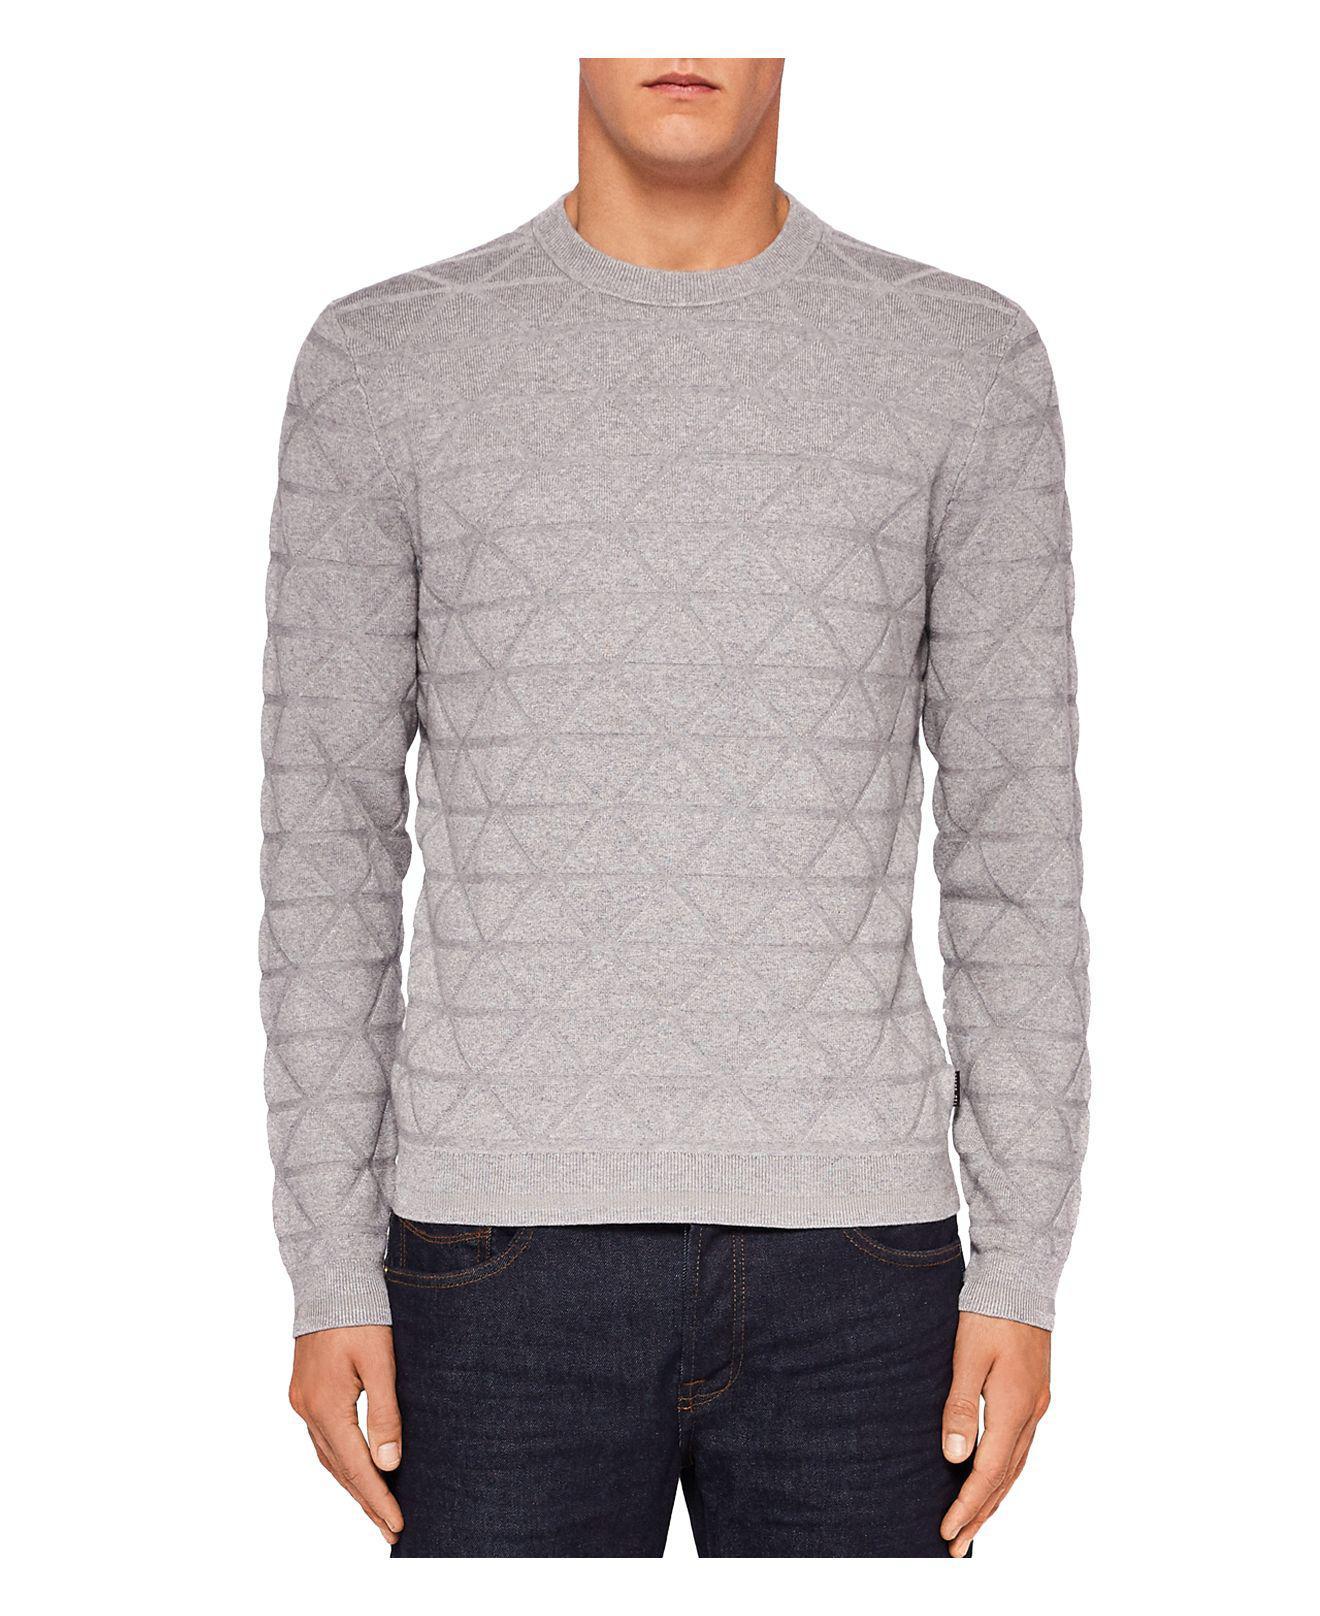 d4e767d247c1d7 Lyst - Ted Baker Matcha Interest Stitch Crewneck Sweater in Gray for Men